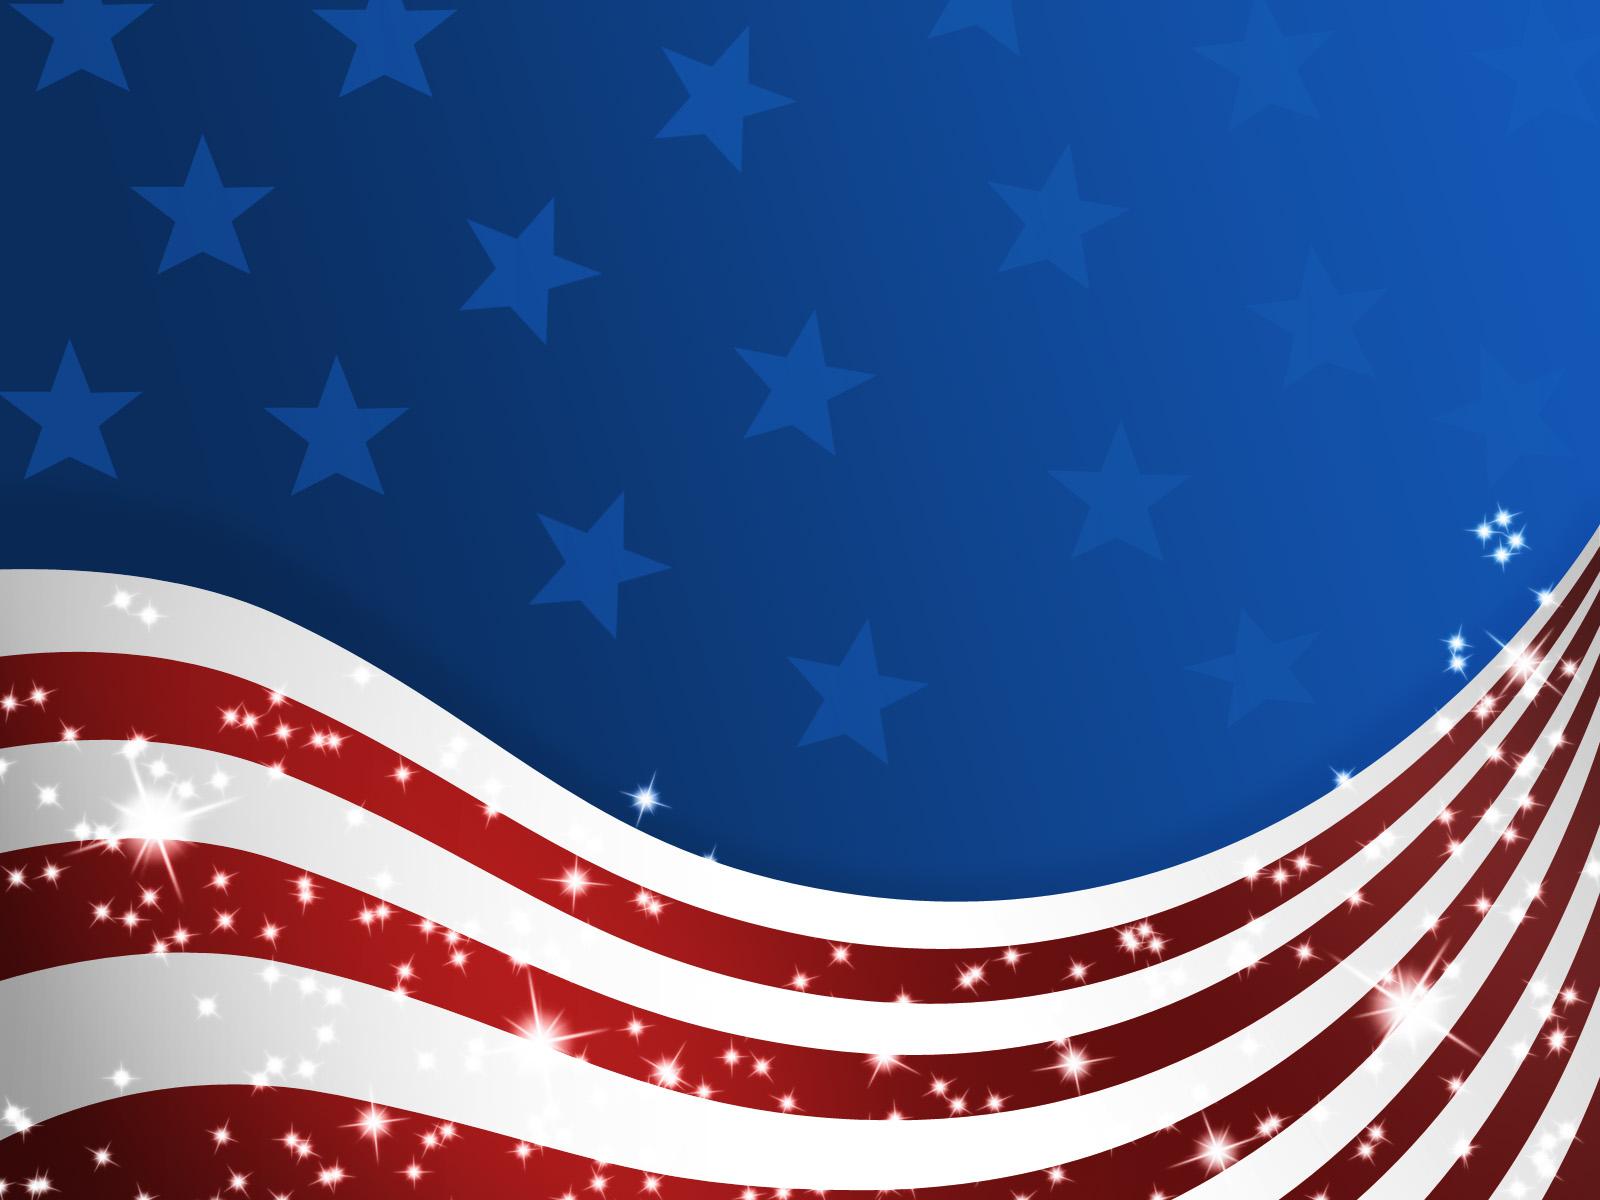 Download Patriotic Wallpaper 2299 1600x1200 px High 1600x1200